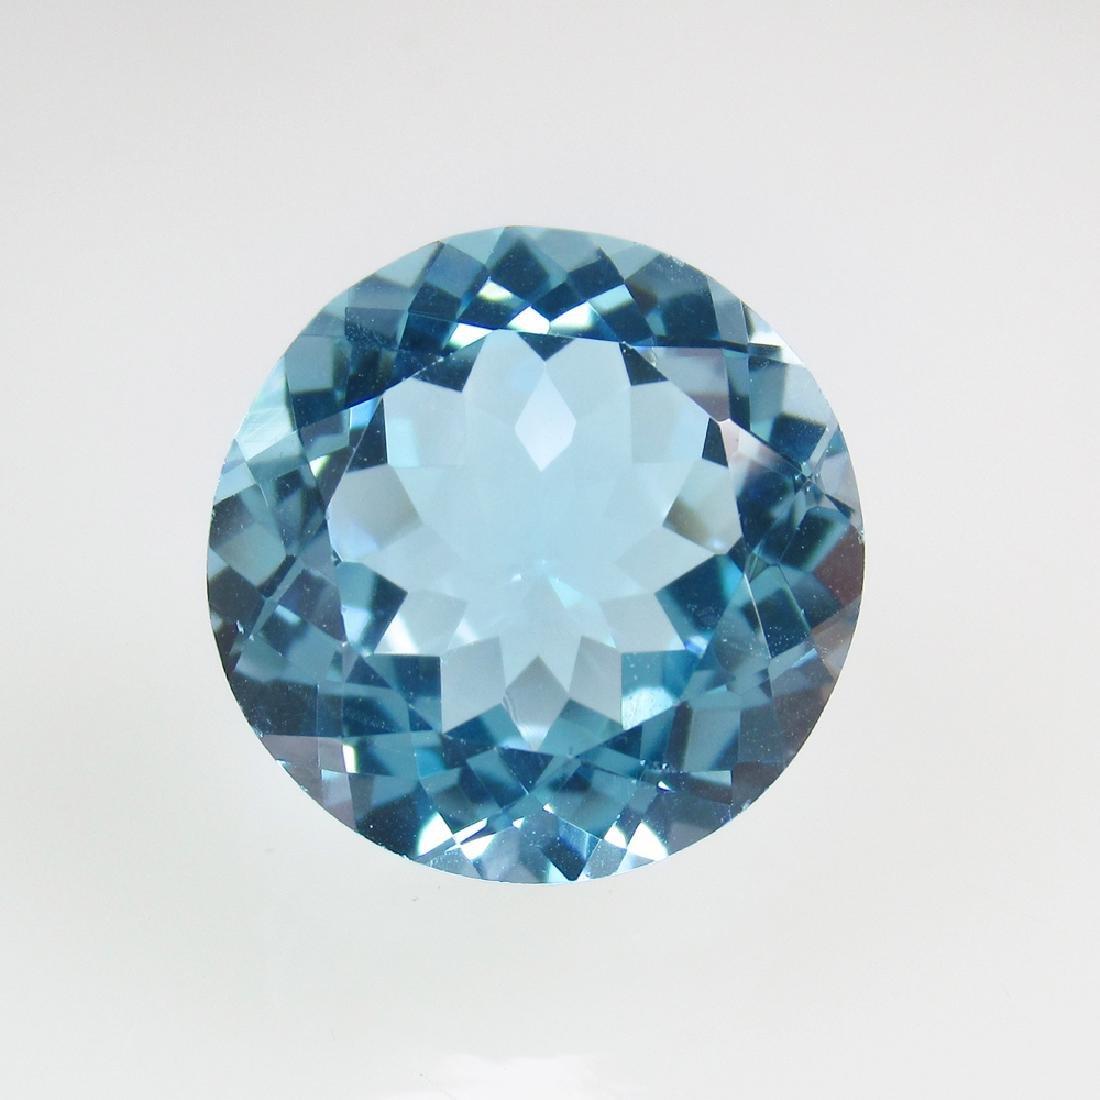 11.37 Ct Genuine Brazil Blue Topaz 14X14 mm Round Cut